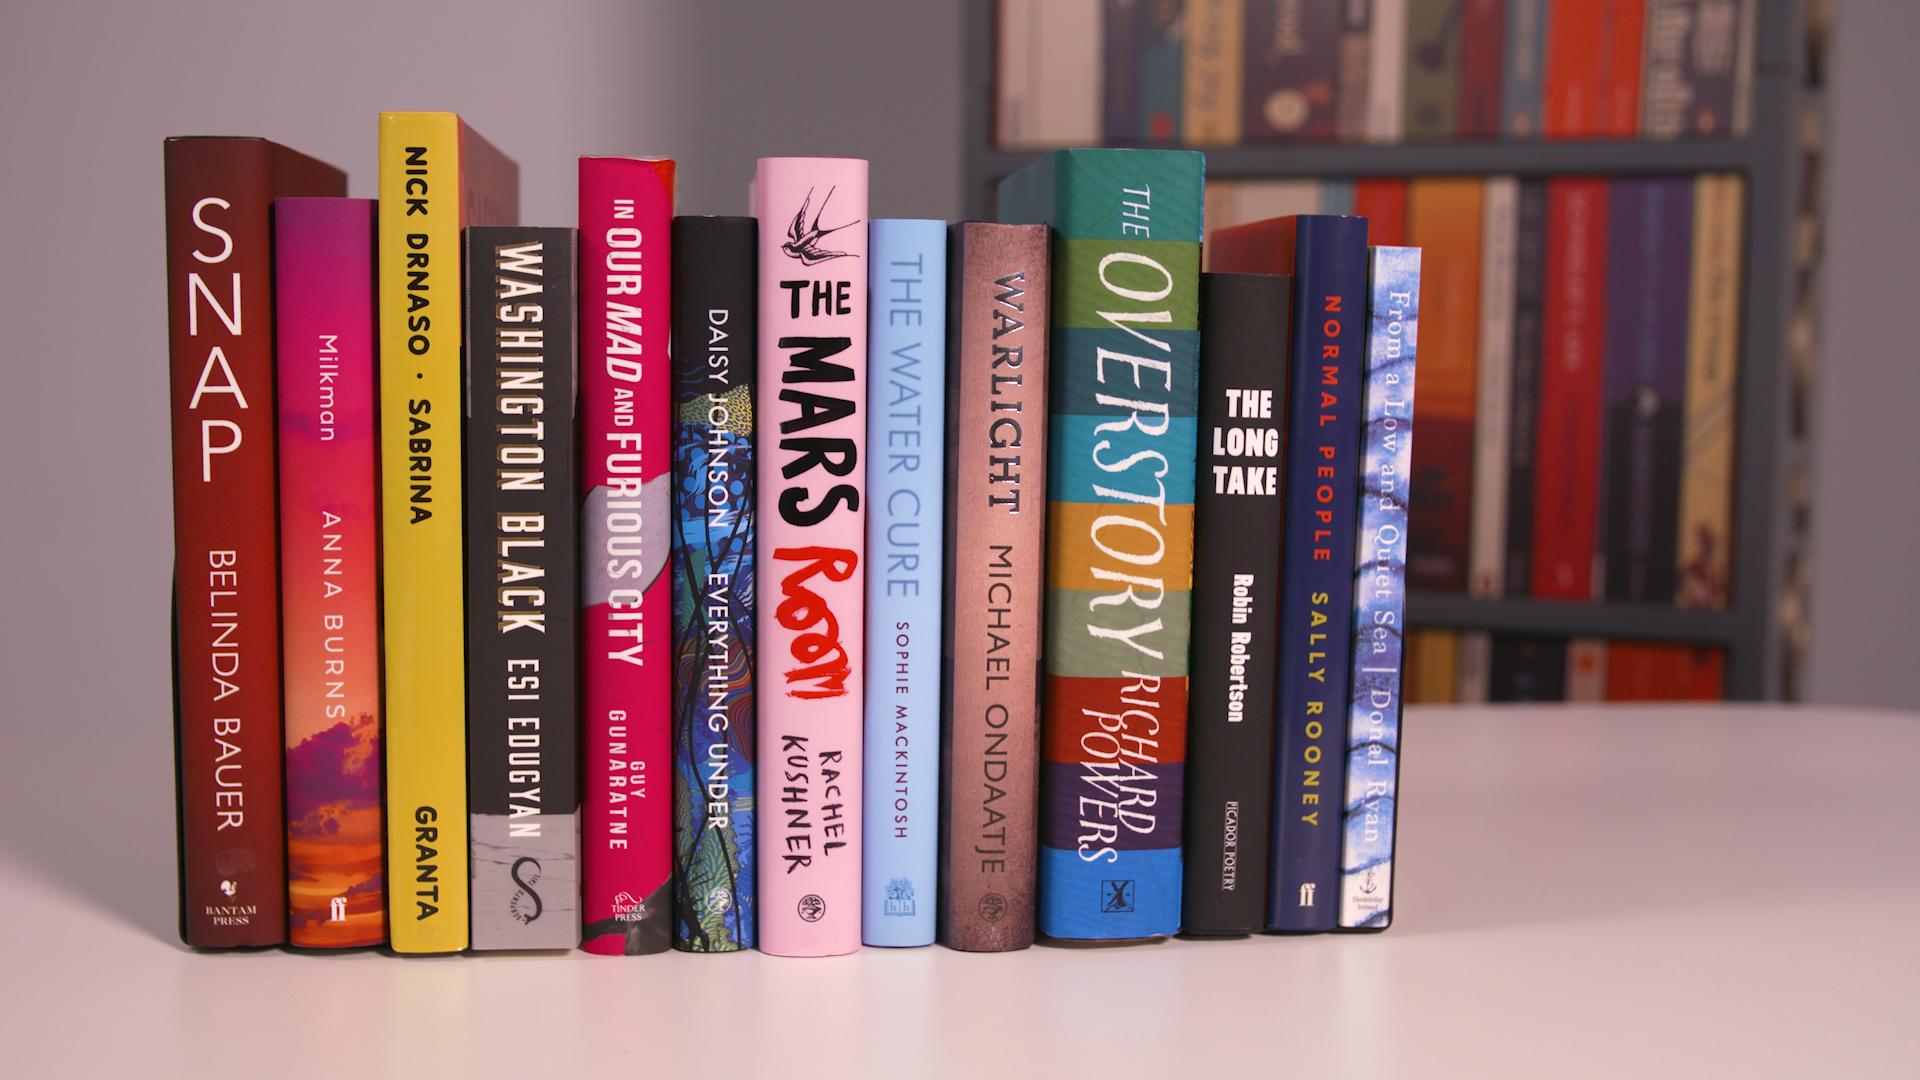 Prized Books on Shelf